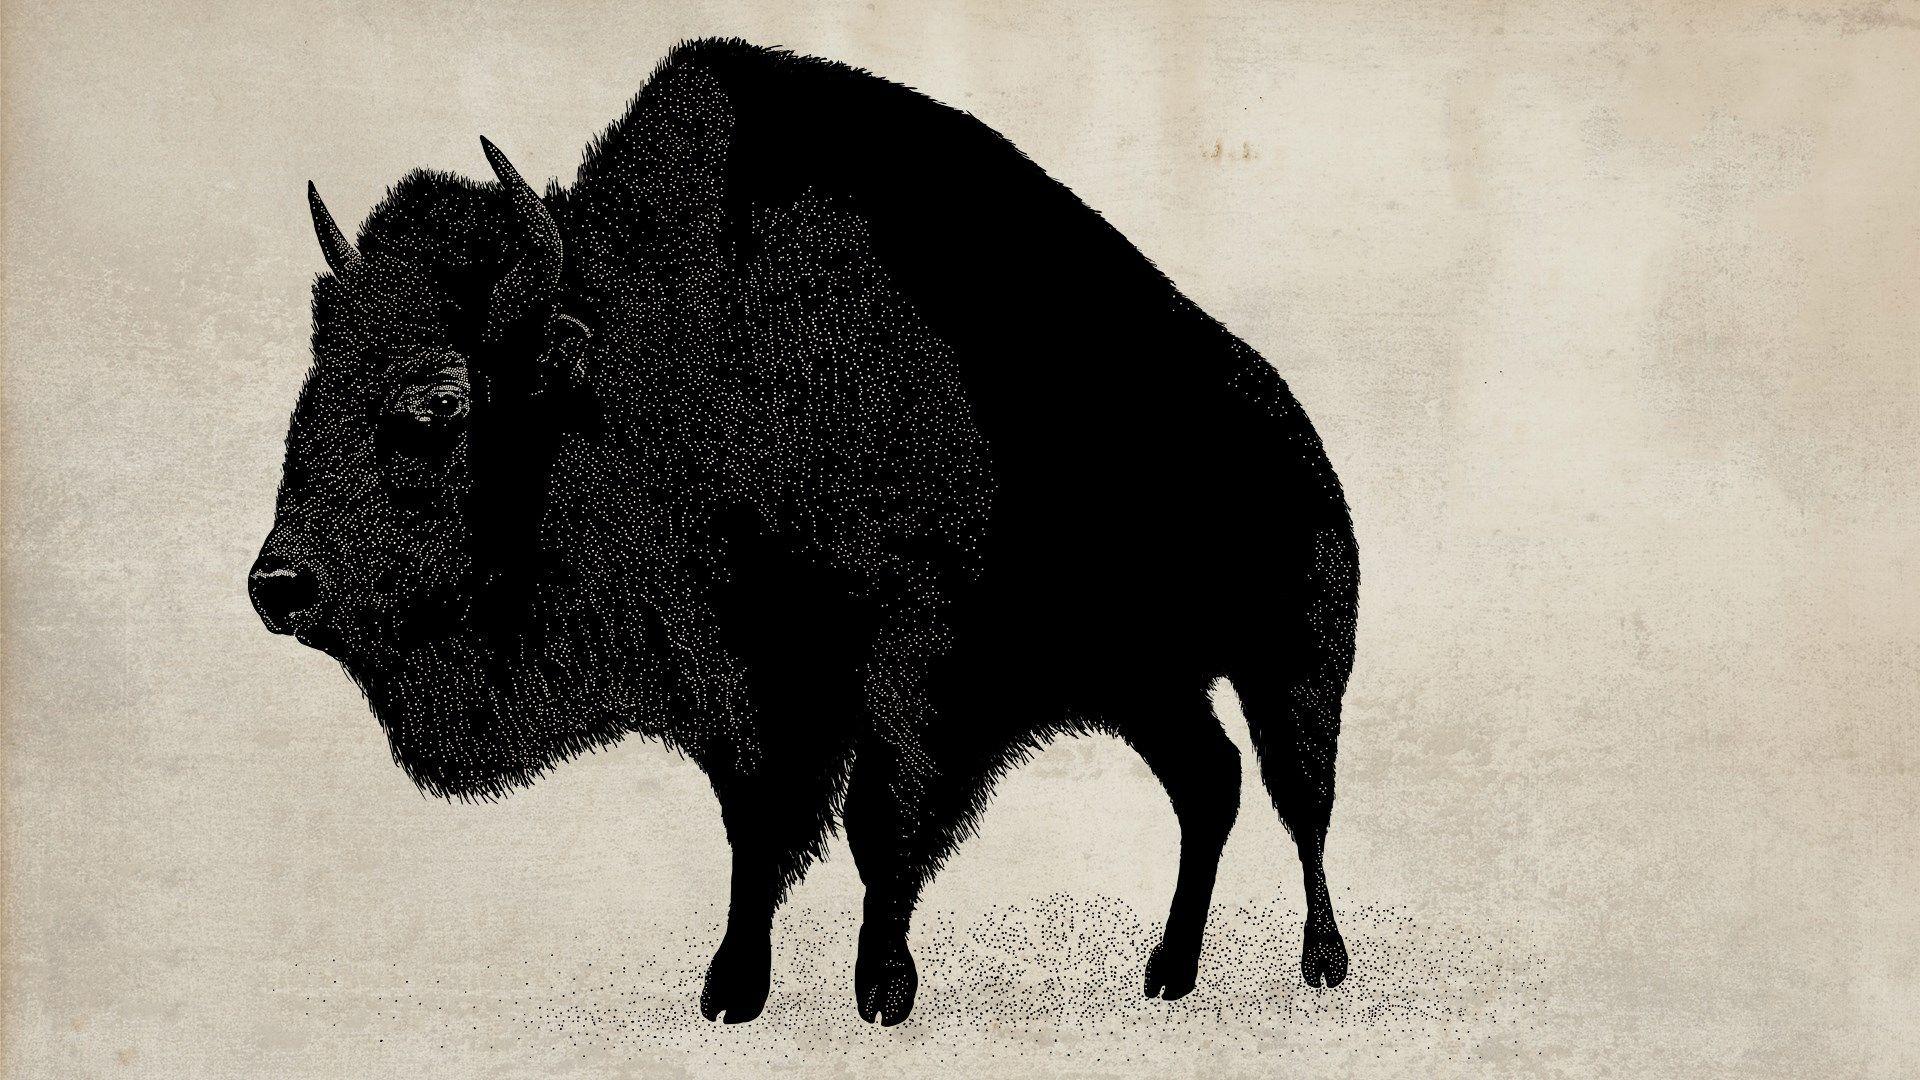 Cool Bison Wallpaper - da7508db1078d58151c49fb811ac9e20  Pictures_483750.jpg